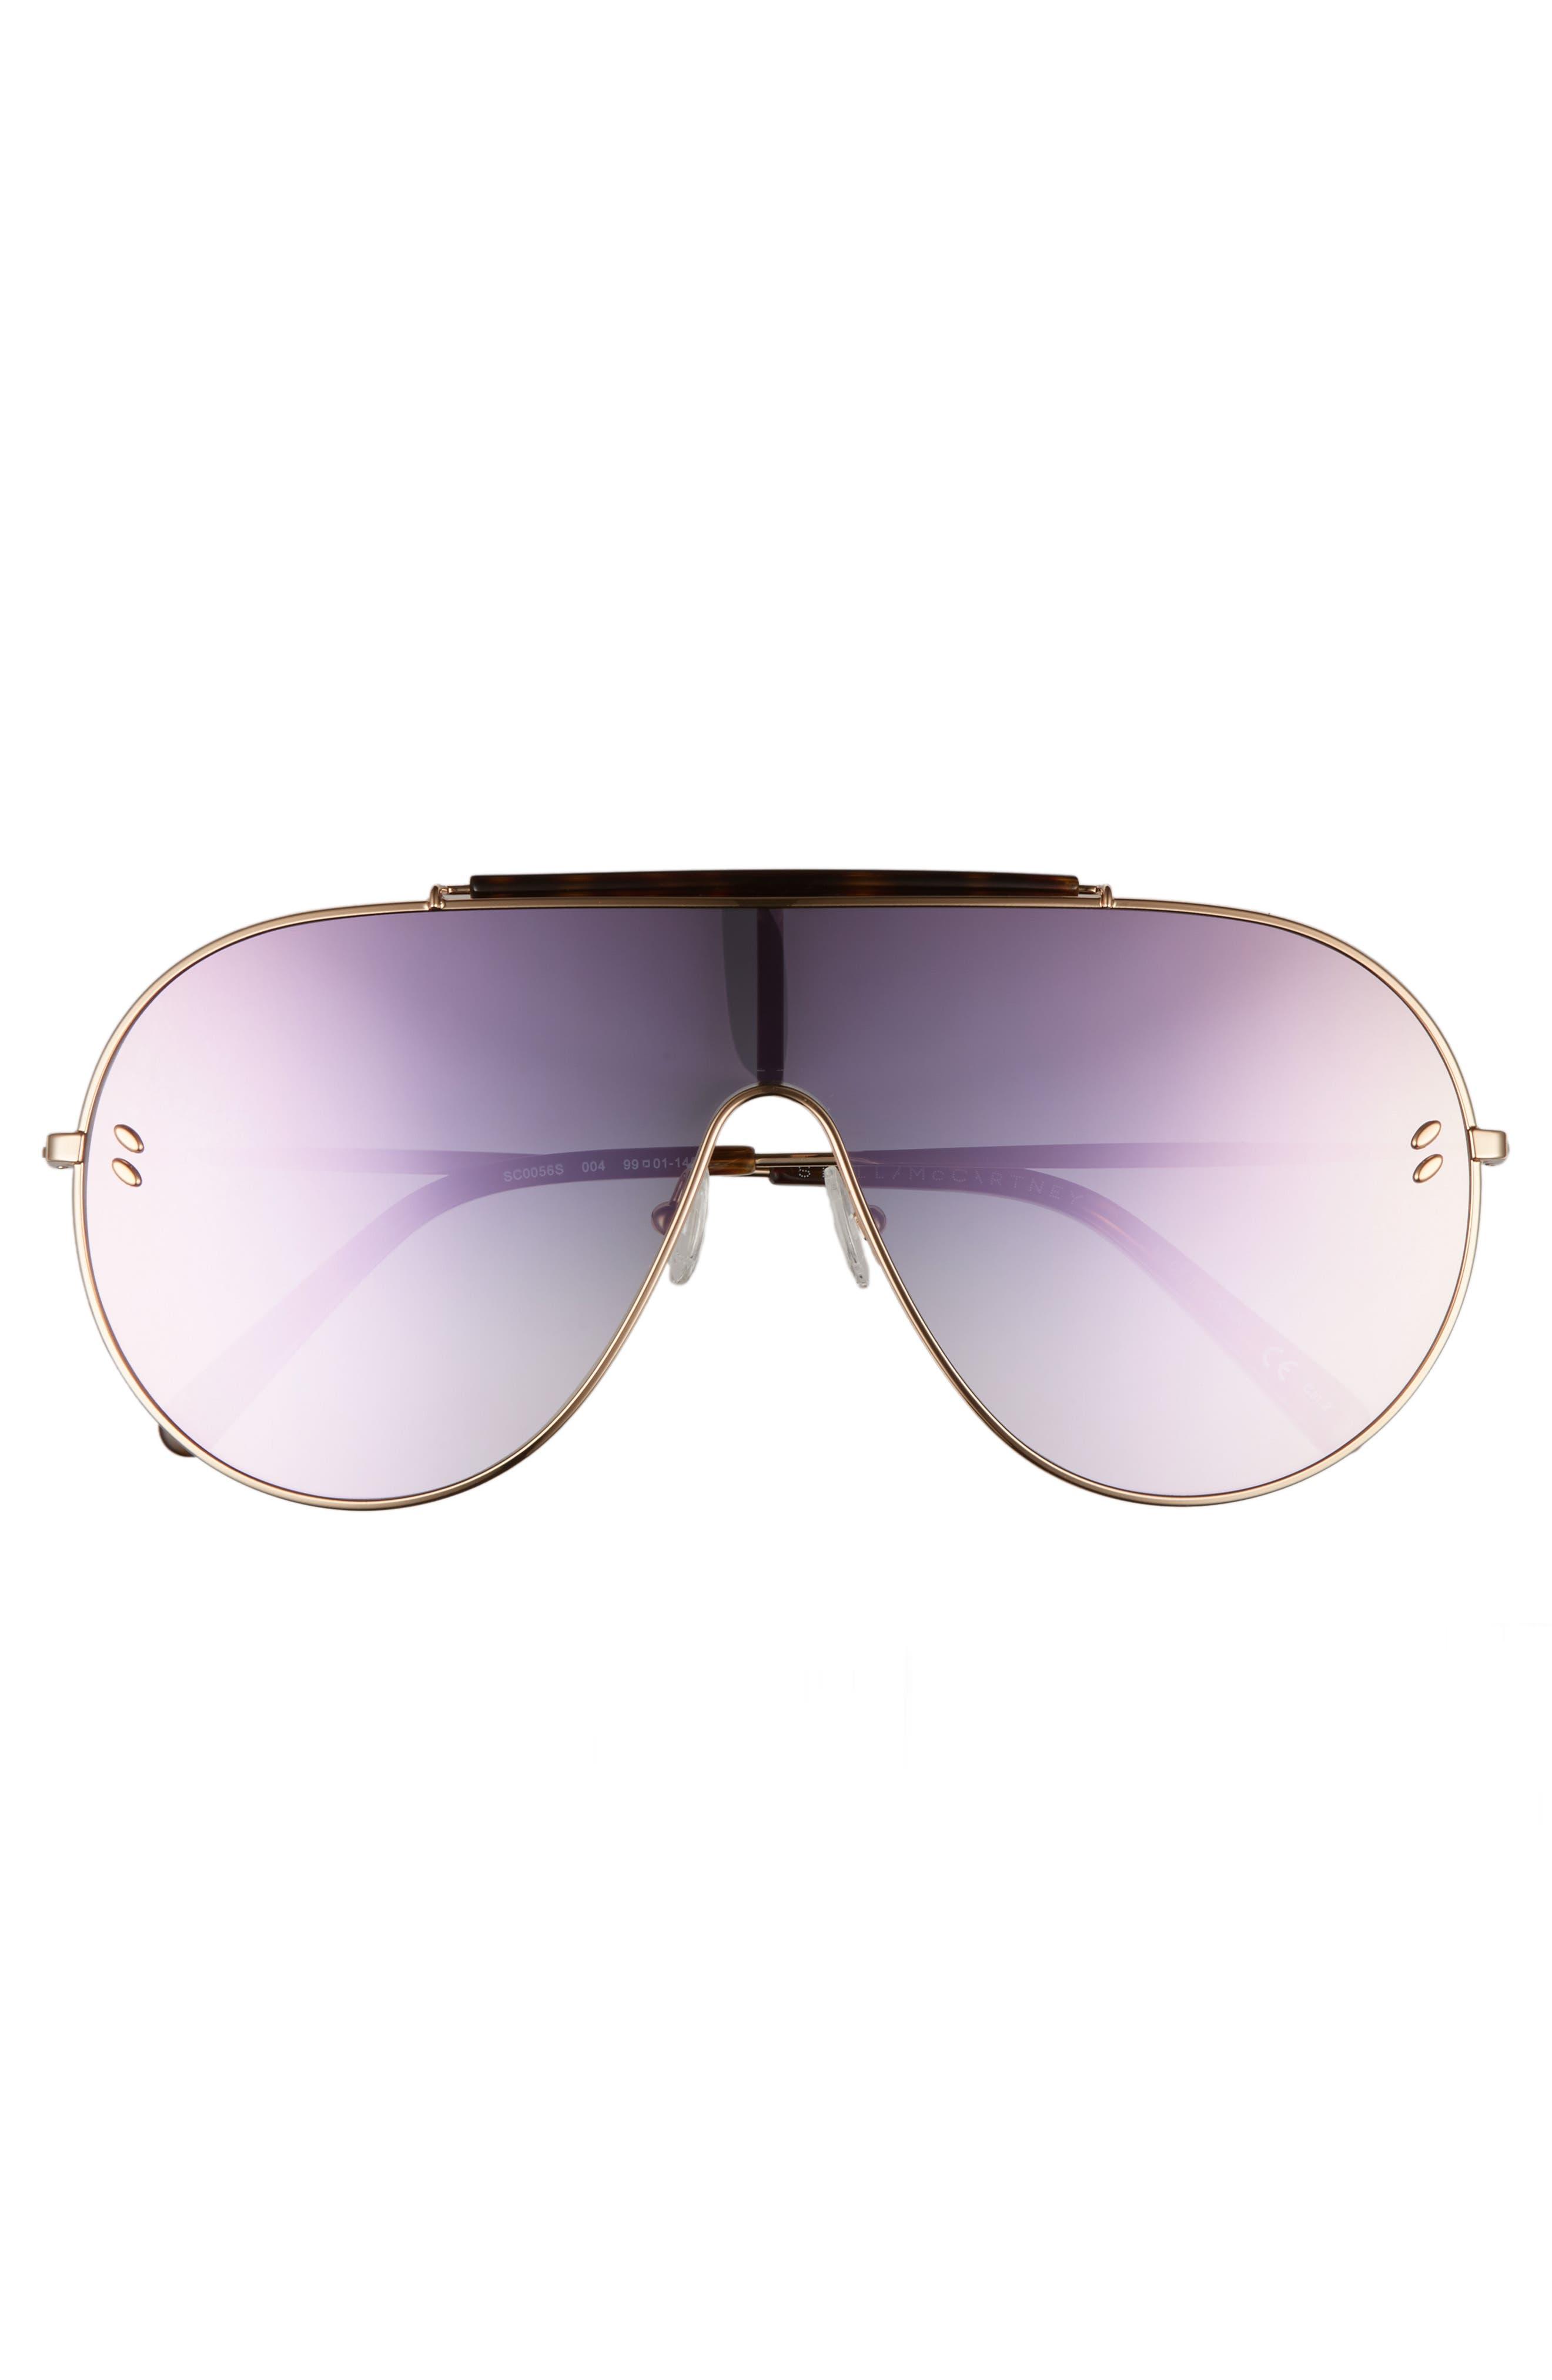 65mm Shield Sunglasses,                             Alternate thumbnail 3, color,                             Gold